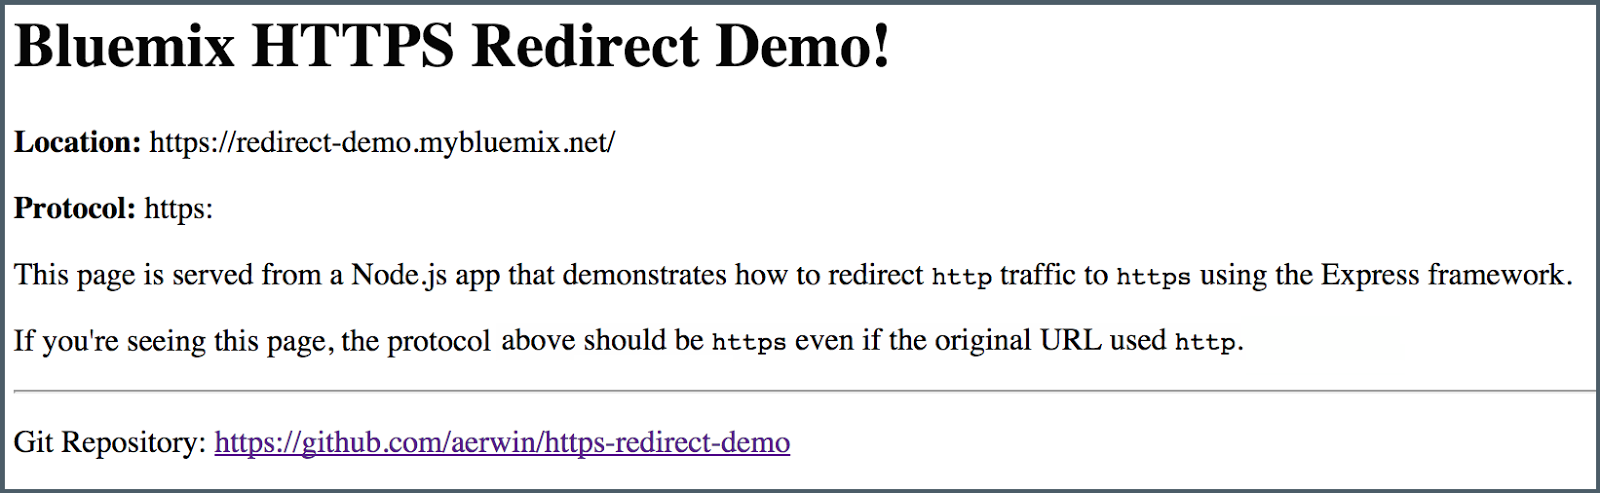 Screenshot of HTTPS Redirect Demo